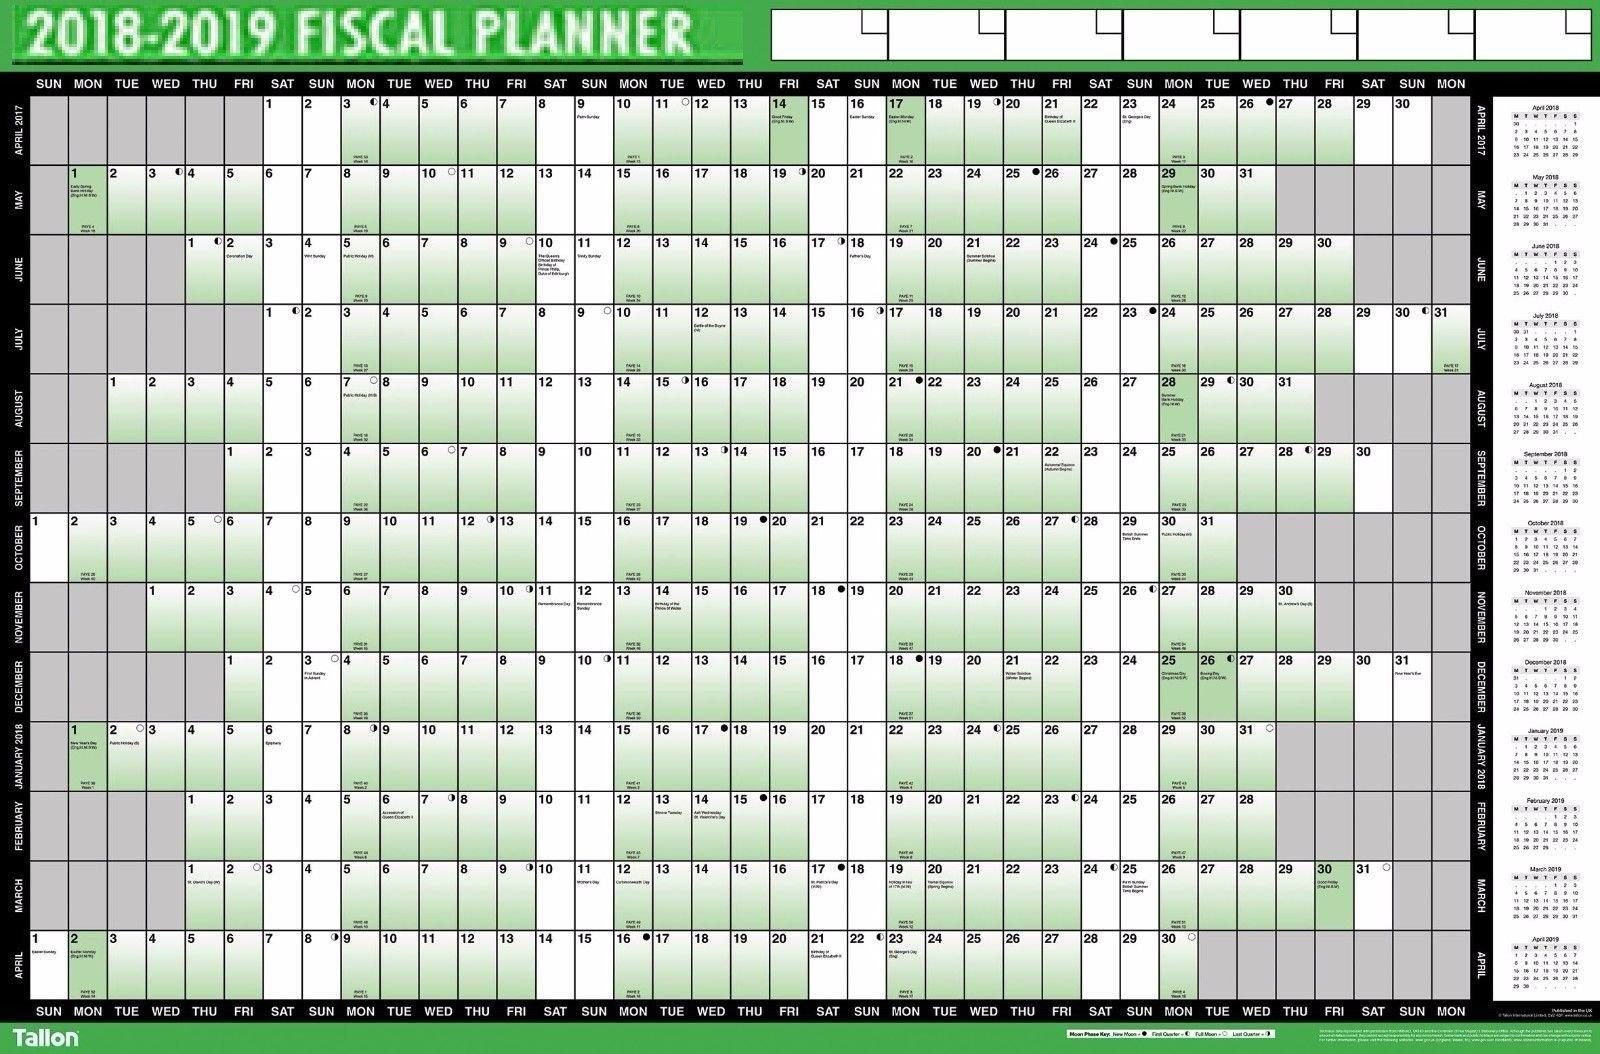 Mid Year Calendar : Financial fiscal wall planner mid year calendar